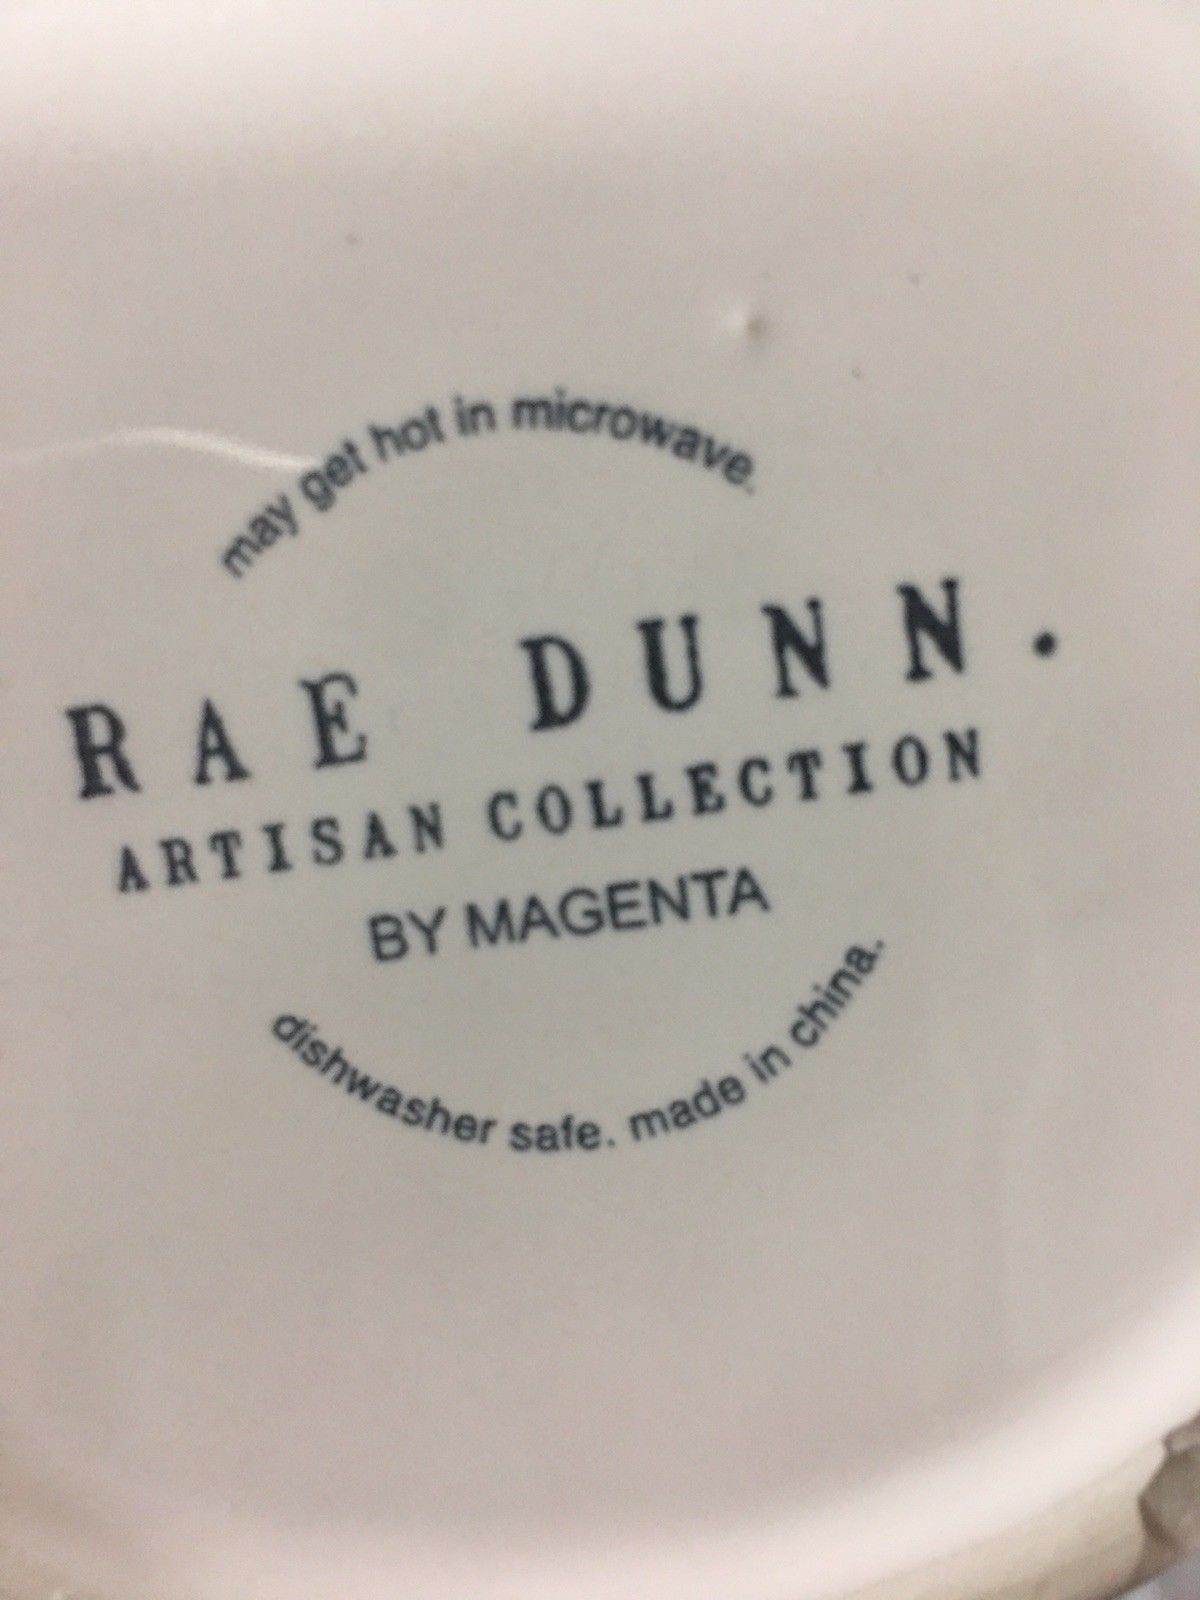 Rae Dunn By Magenta Bride Groom Mugs Artisan Collection